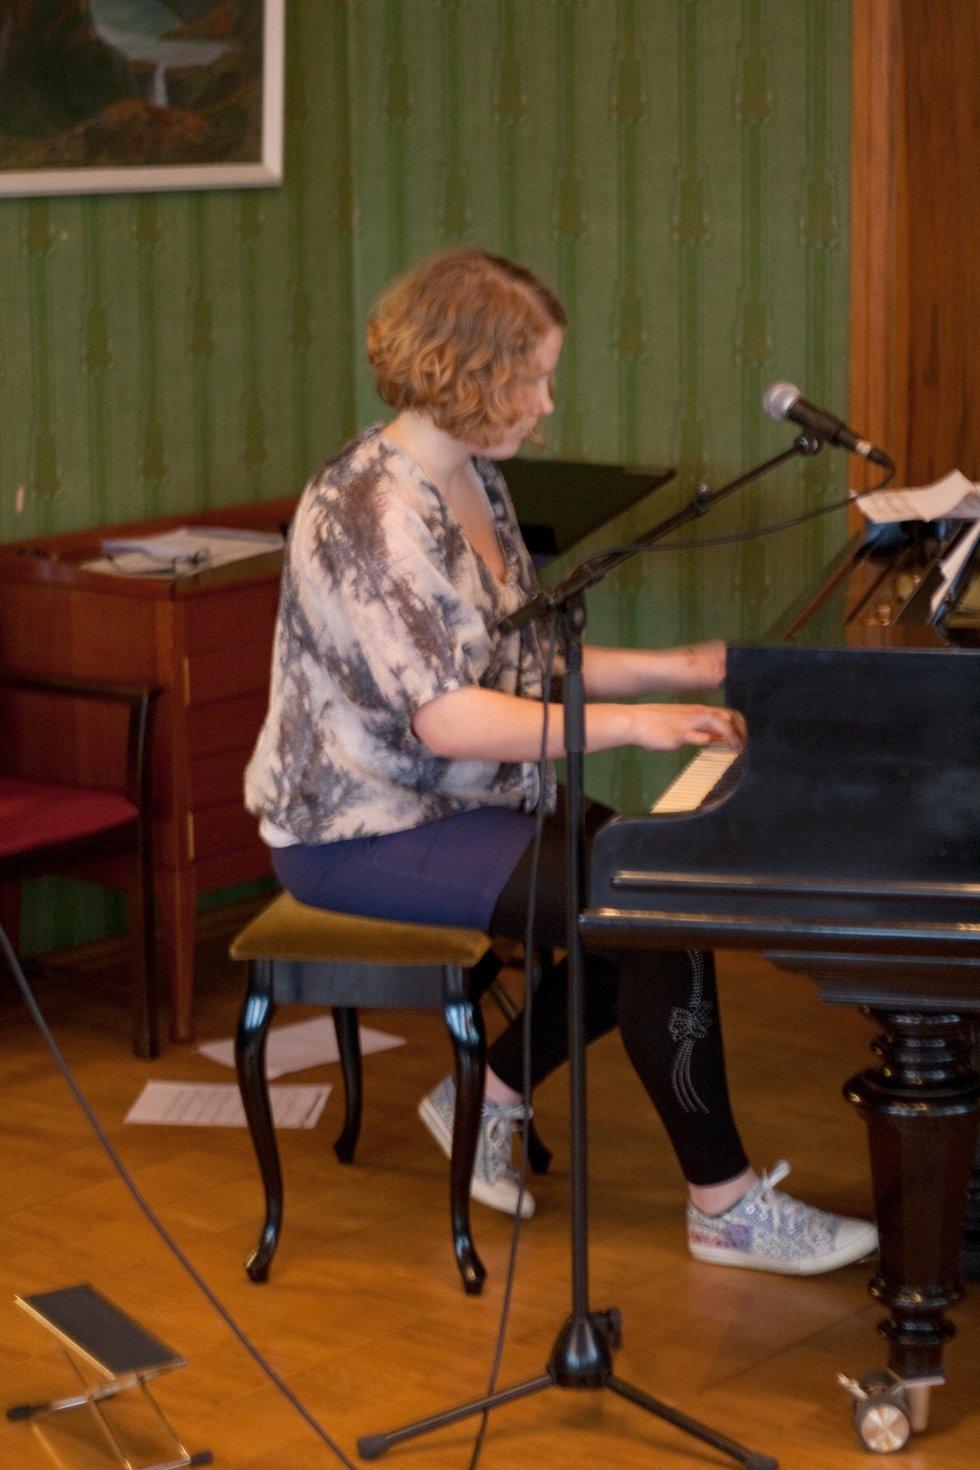 Audhild Margrethe Ruud (14, Marker) spilte og sang.